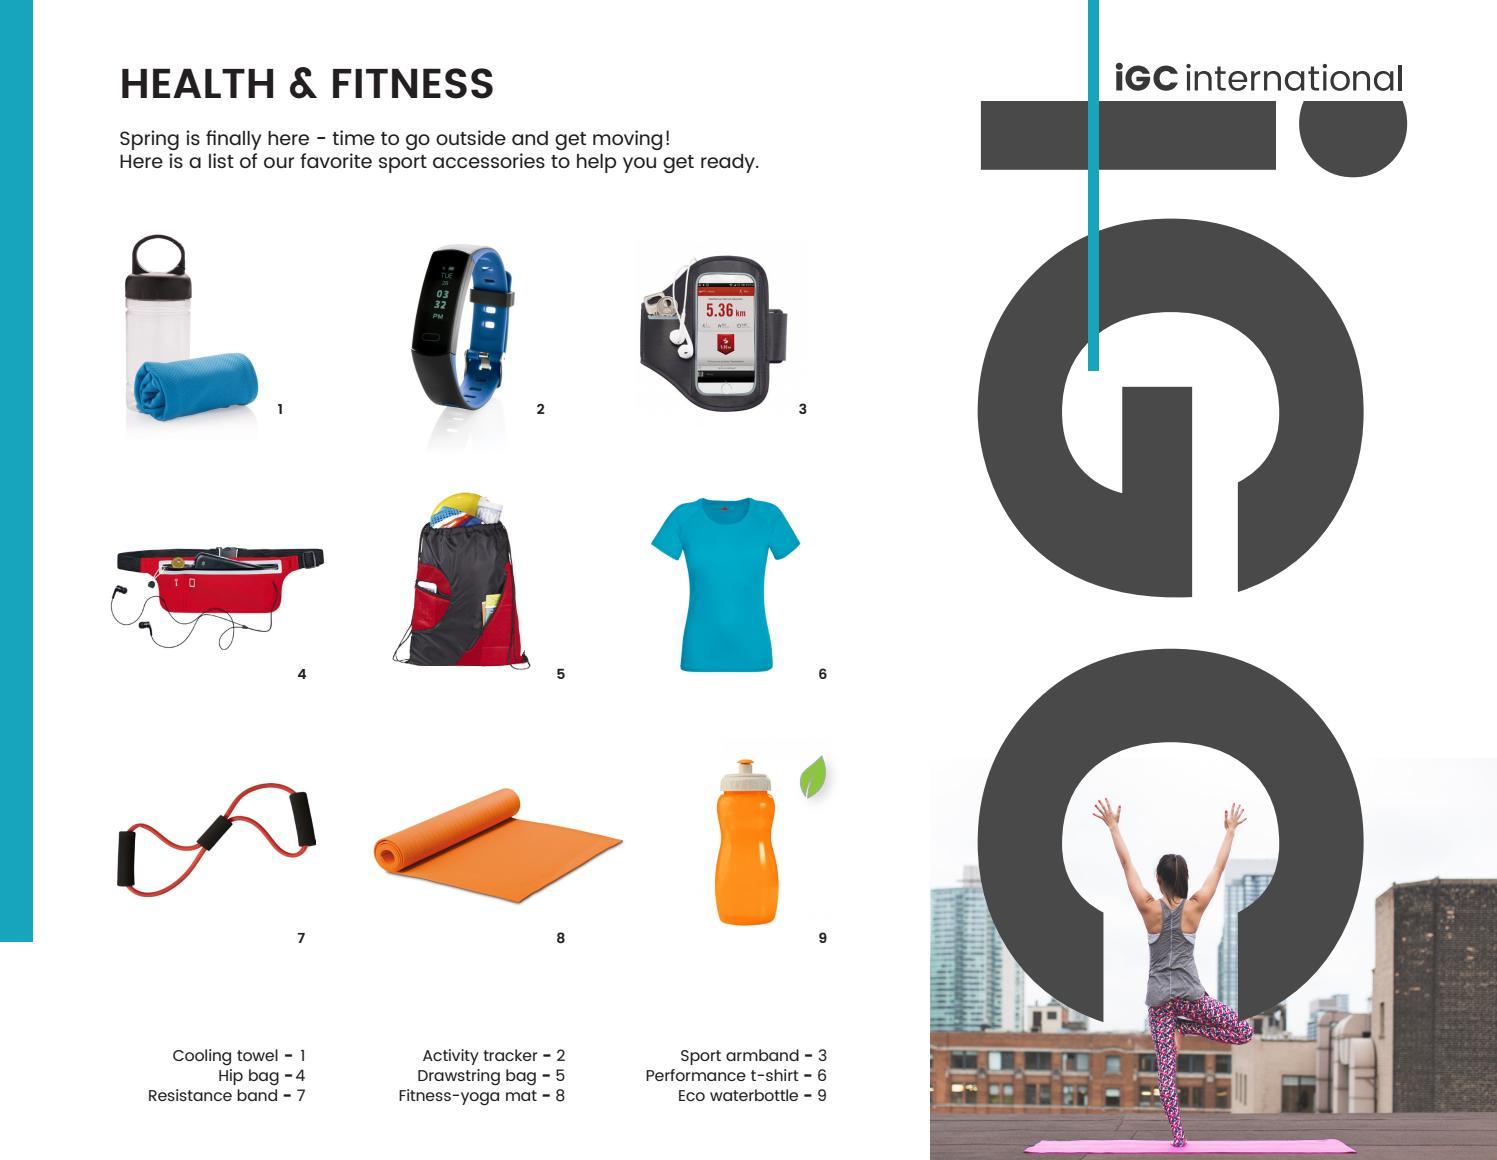 IGC International Spring Health & Fitness 2019 by IGC International